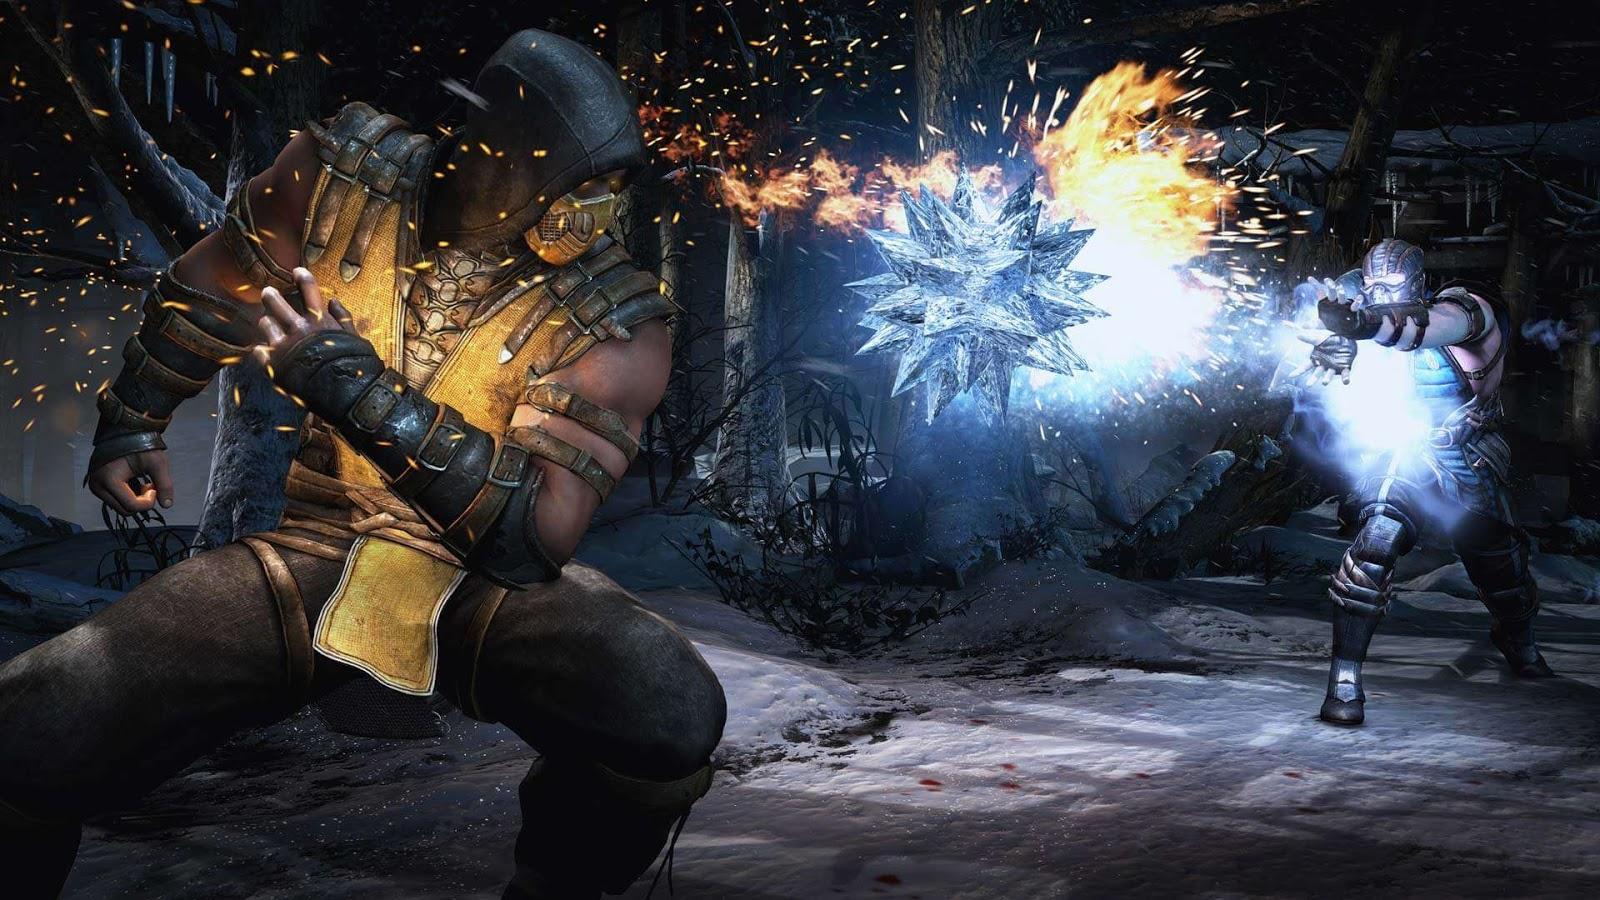 Mortal Kombat X PC - Mortal Kombat X For Pc